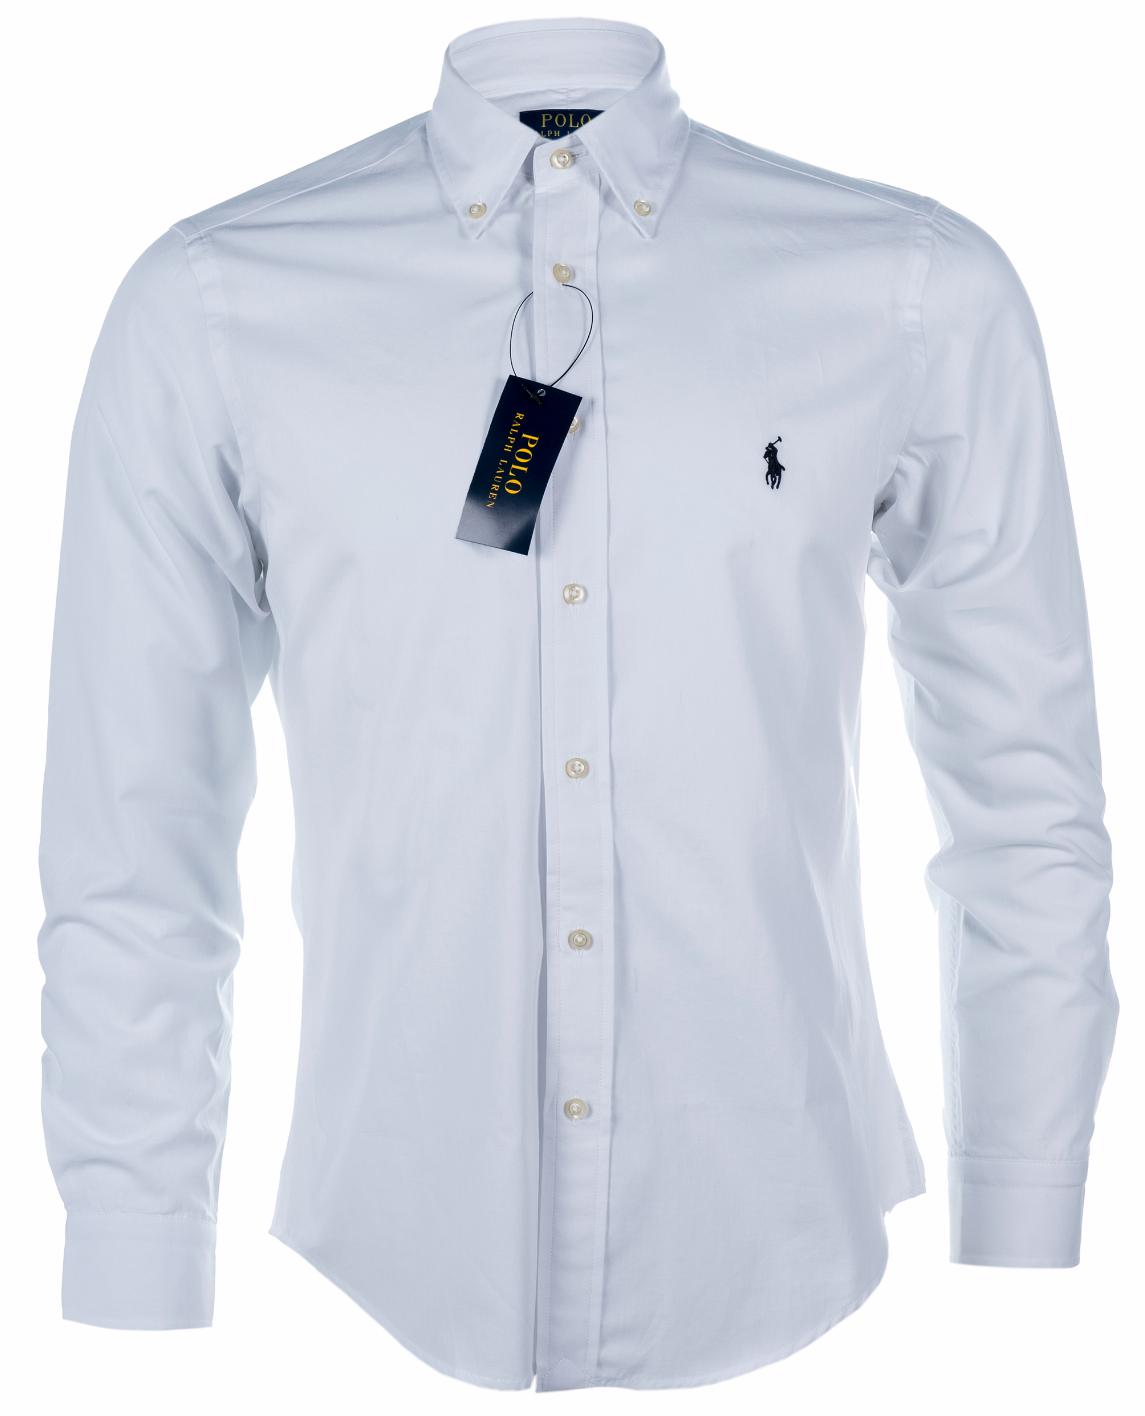 bb36a1798 Koszula Męska Ralph Lauren Polo Slim Fit r. XL/XXL - 7191304888 ...